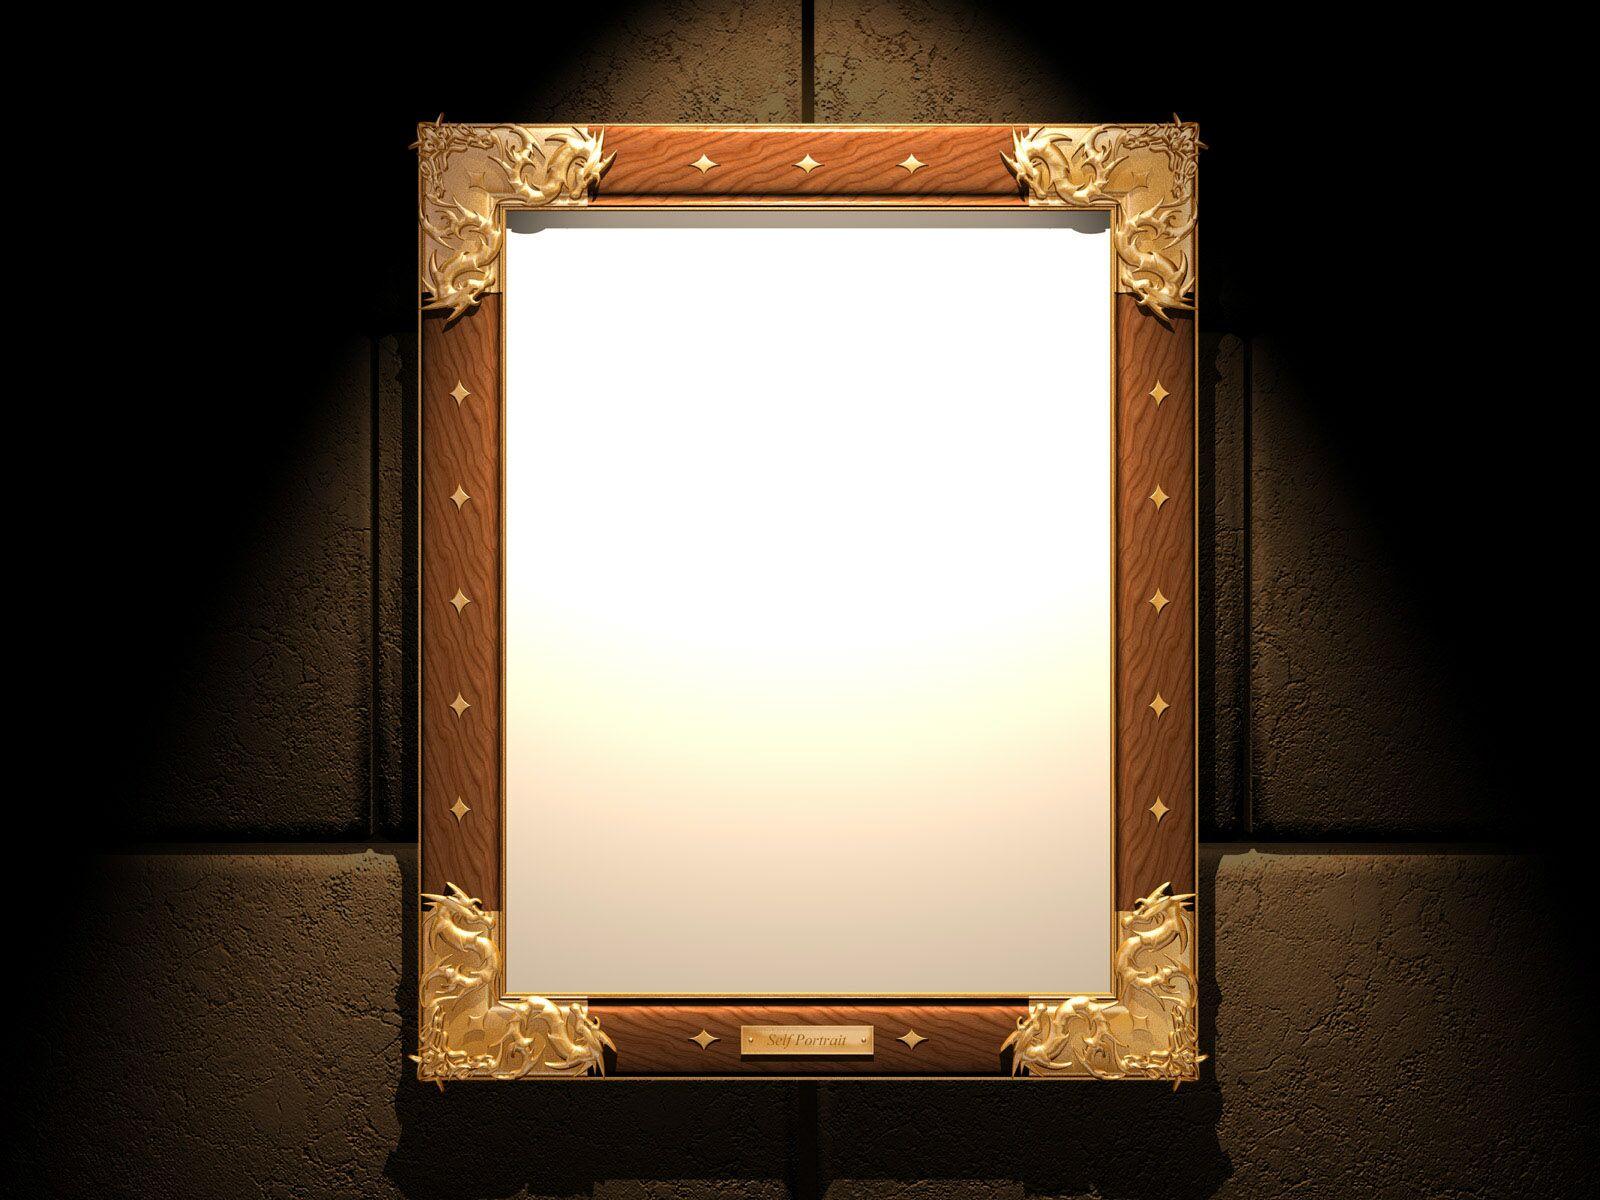 Hd Photo Frame Wallpaper Wallpapersafari HD Wallpapers Download Free Images Wallpaper [1000image.com]